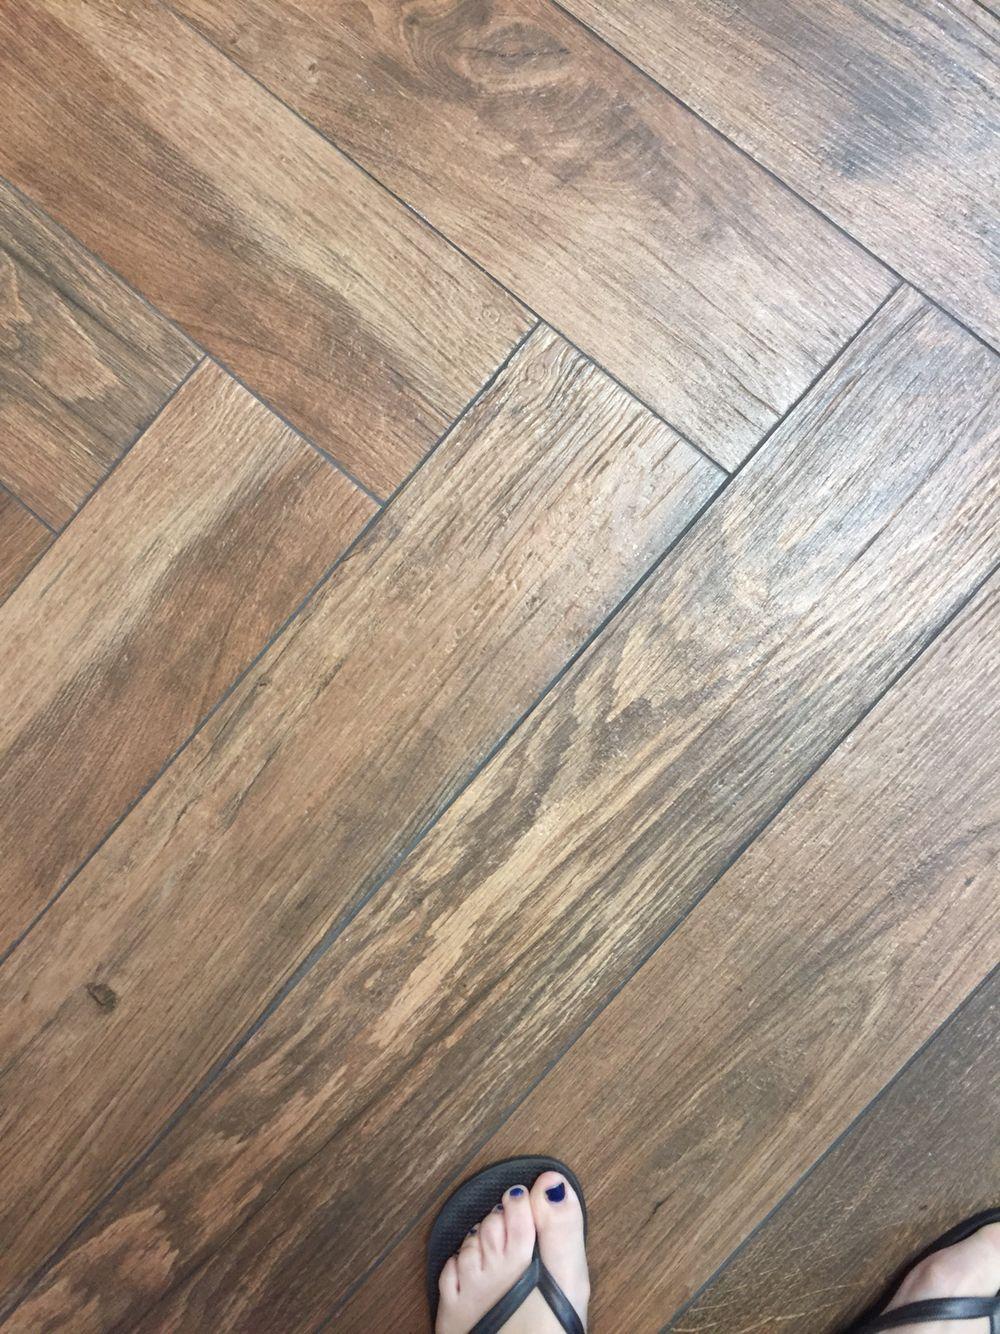 Pier Santa Monica Wood Tile 6x36 Porcelain Hickory Flooring